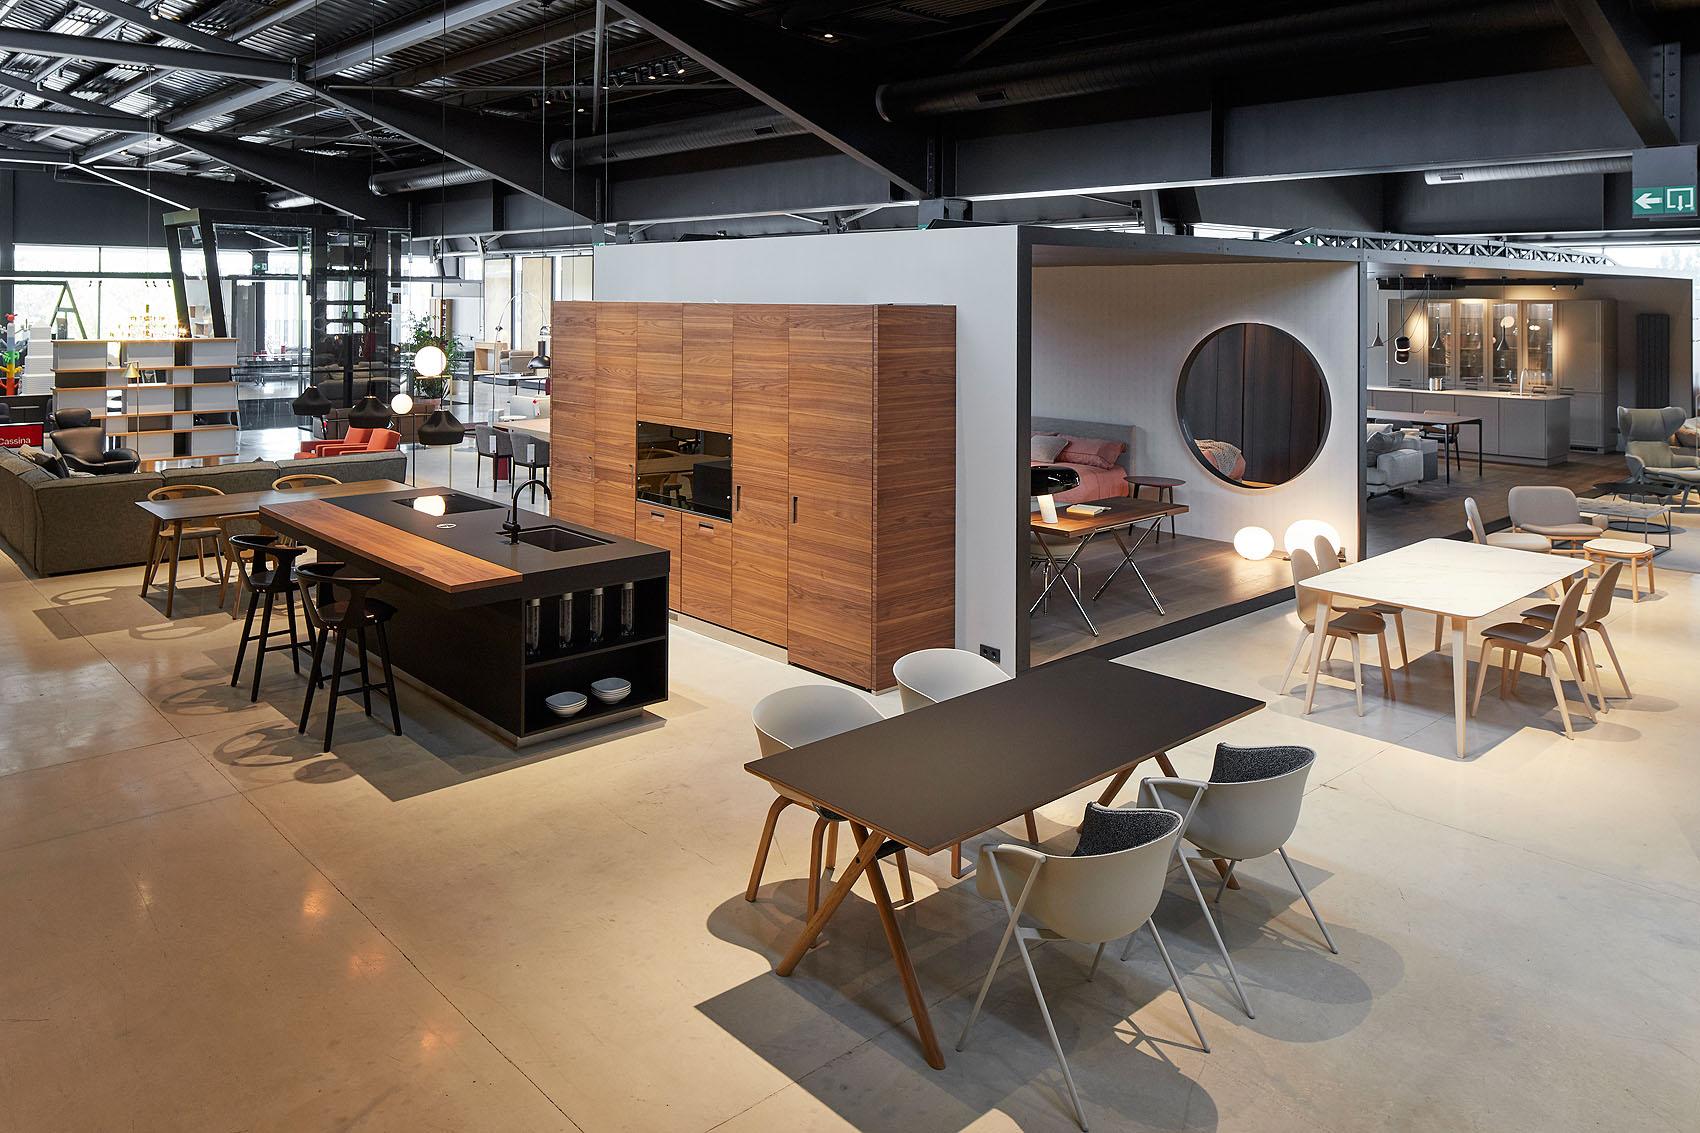 Nuevo Showroom de Saltoki Home - Iñaki Caperochipi - Fotografía